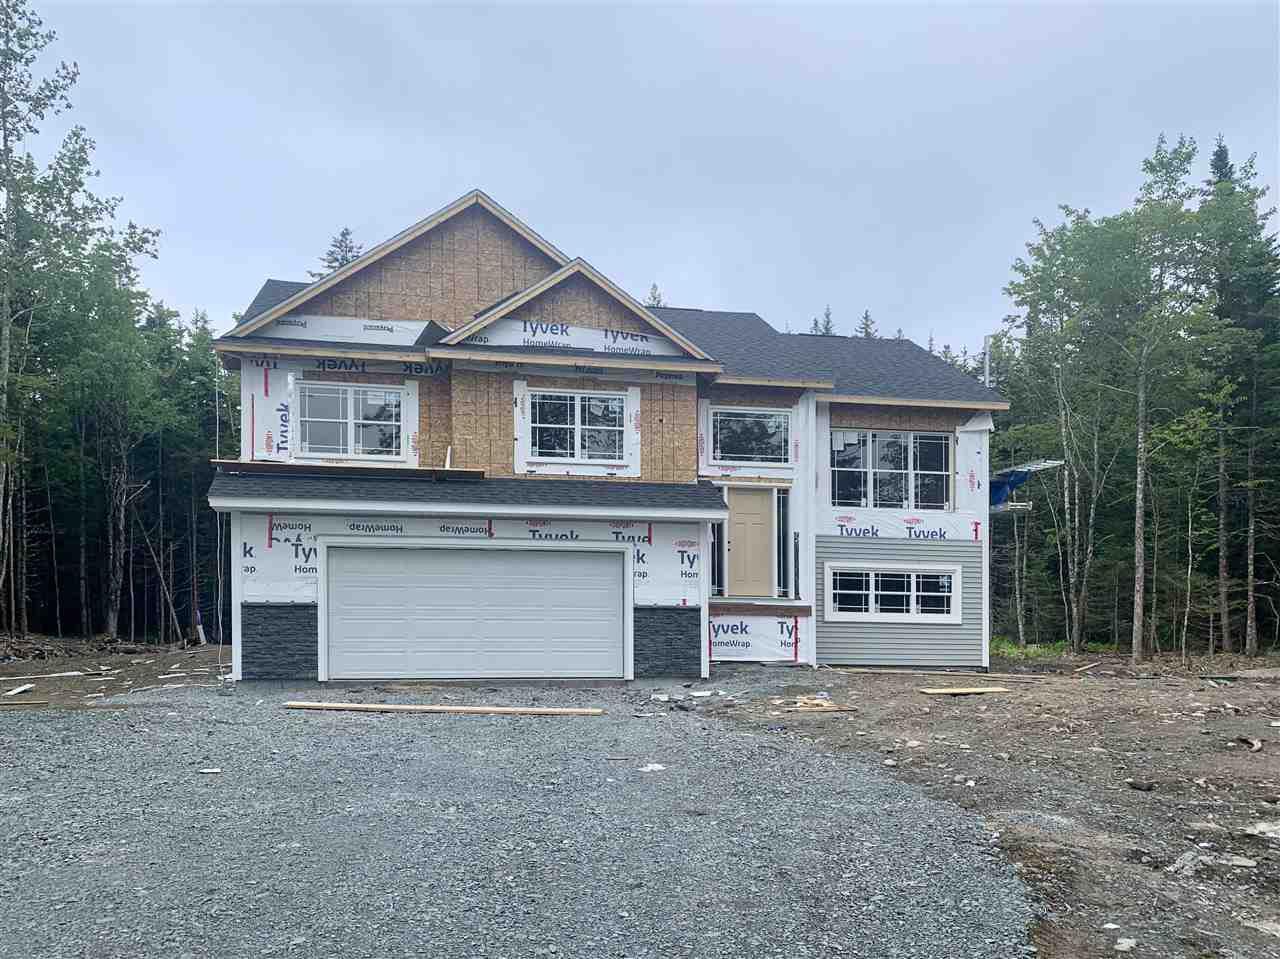 Main Photo: Lot 724 627 Magenta Drive in Sackville: 26-Beaverbank, Upper Sackville Residential for sale (Halifax-Dartmouth)  : MLS®# 201922855